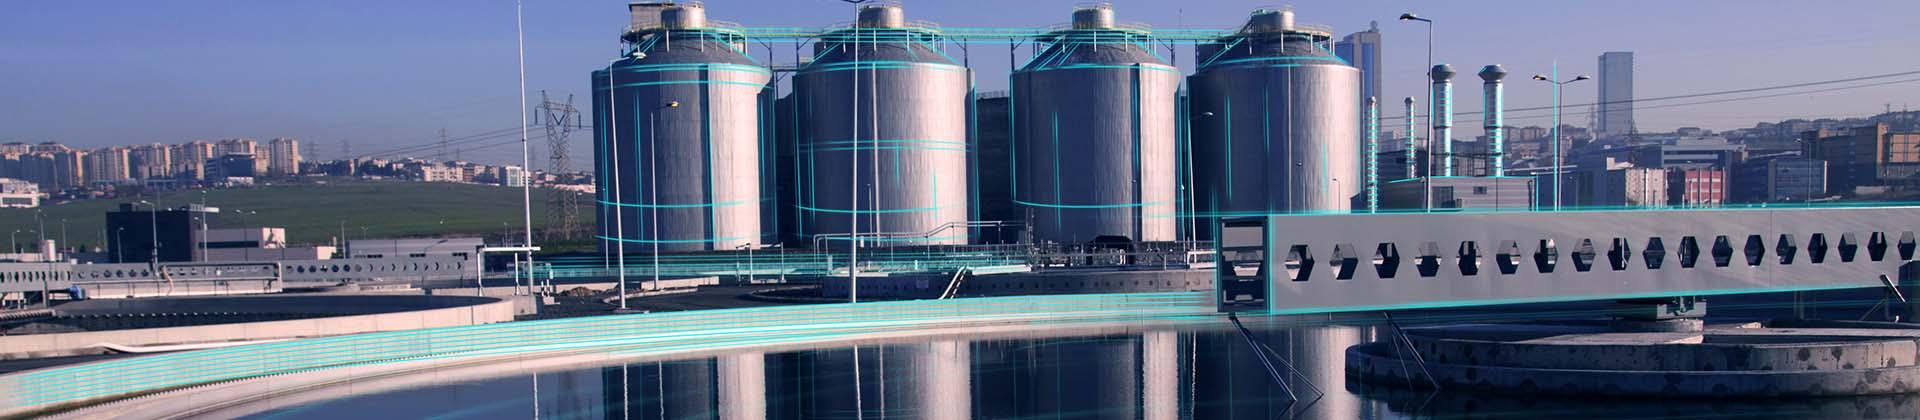 wastewater treatment plant, sludge treatment